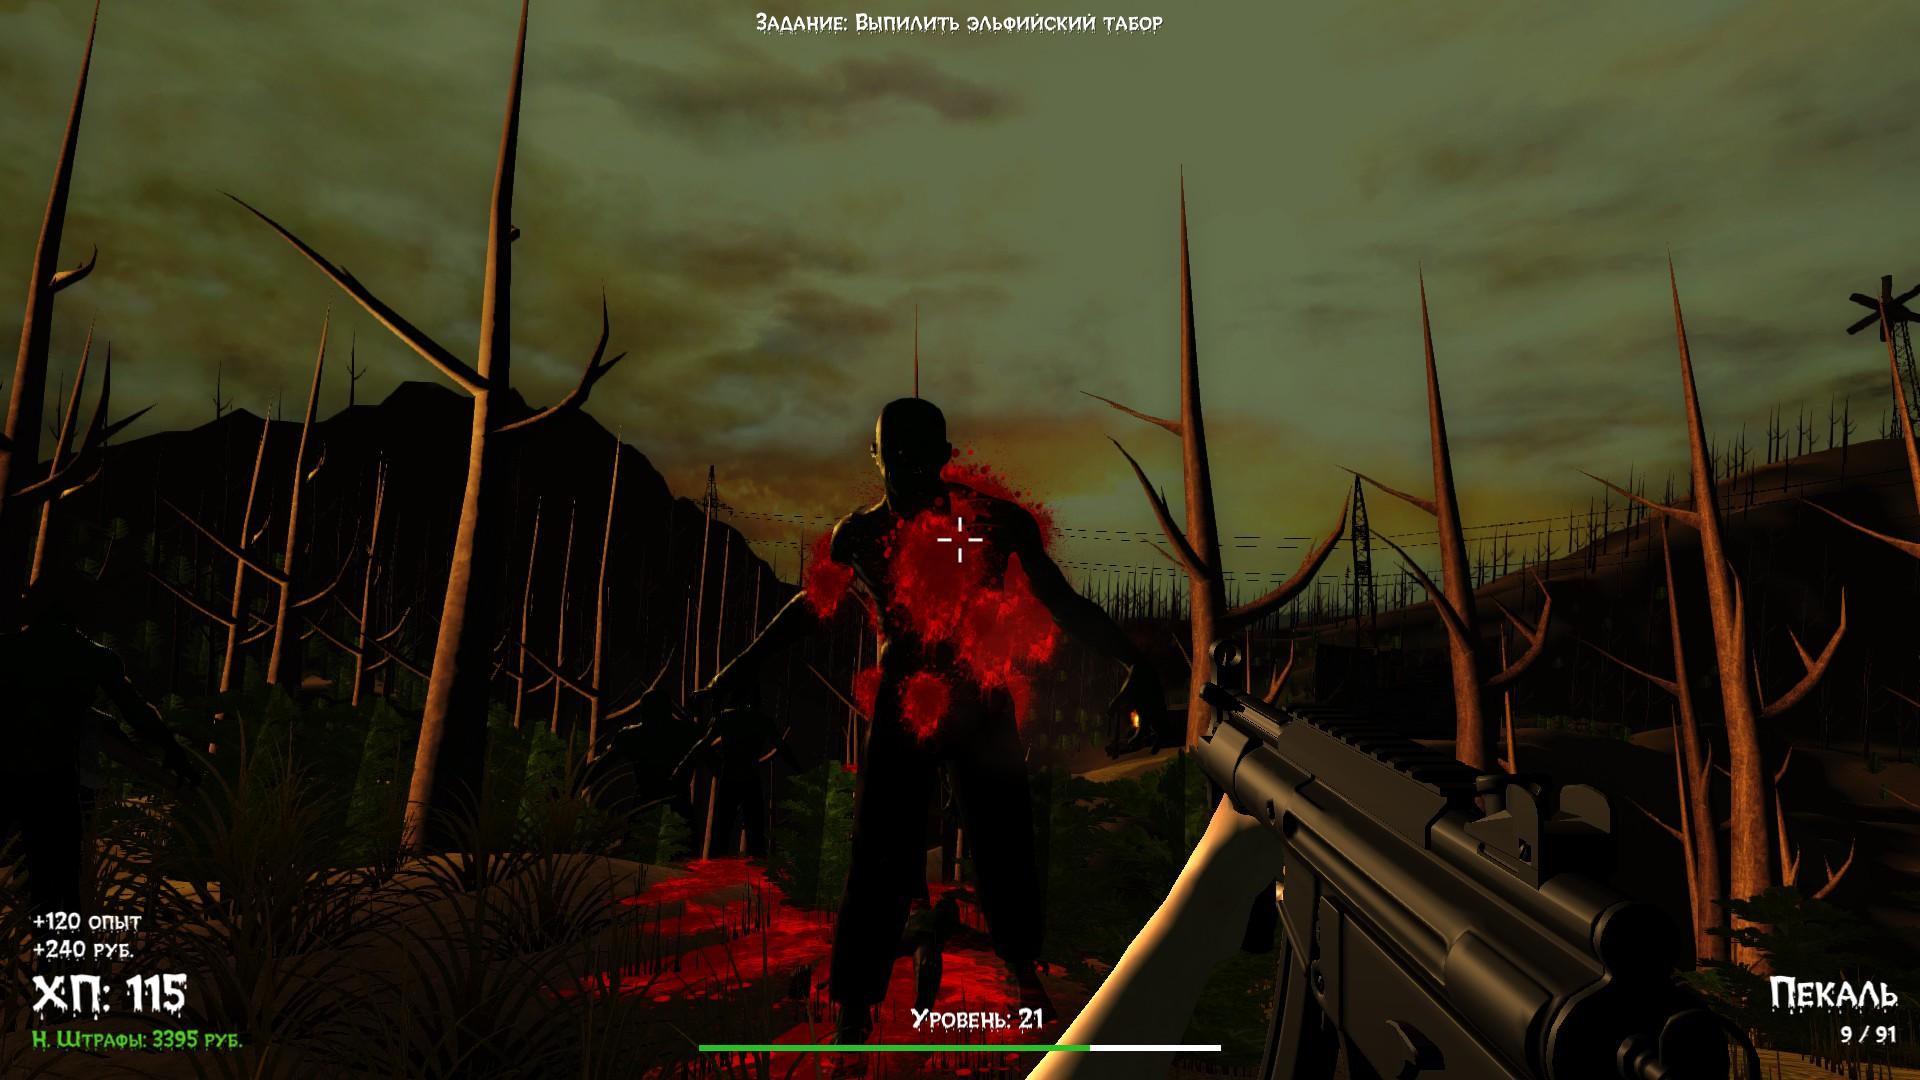 DOKA 2: Humans, Wizards and Elves DLC#1 screenshot